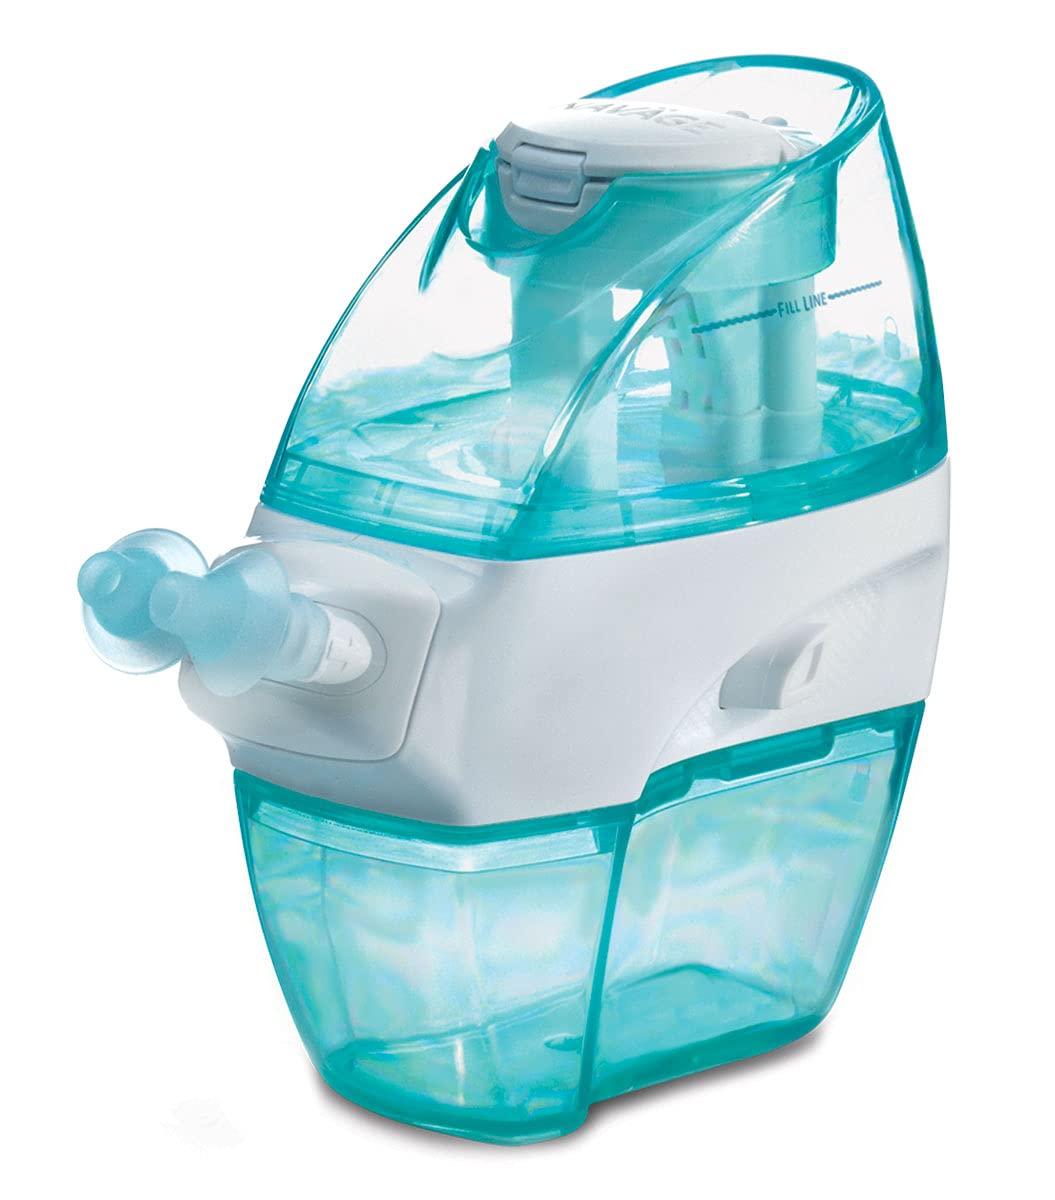 Navage Nasal Care Starter Bundle: Navage Nose Cleaner and 20 SaltPod Capsules